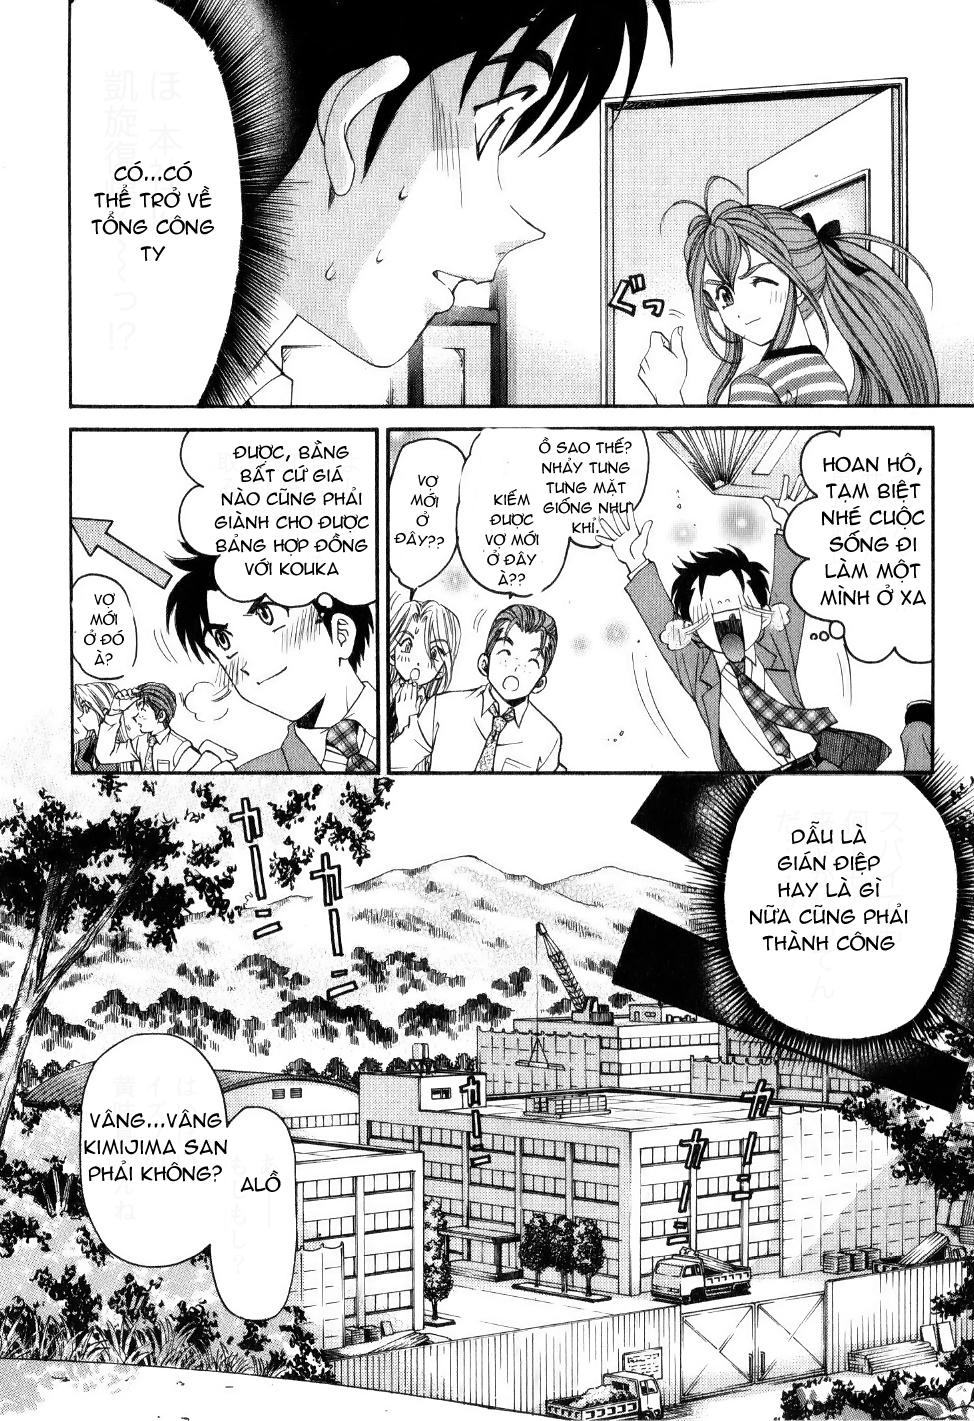 TruyenHay.Com - Ảnh 24 - Virgin Na Kankei R [P2] Chap 9